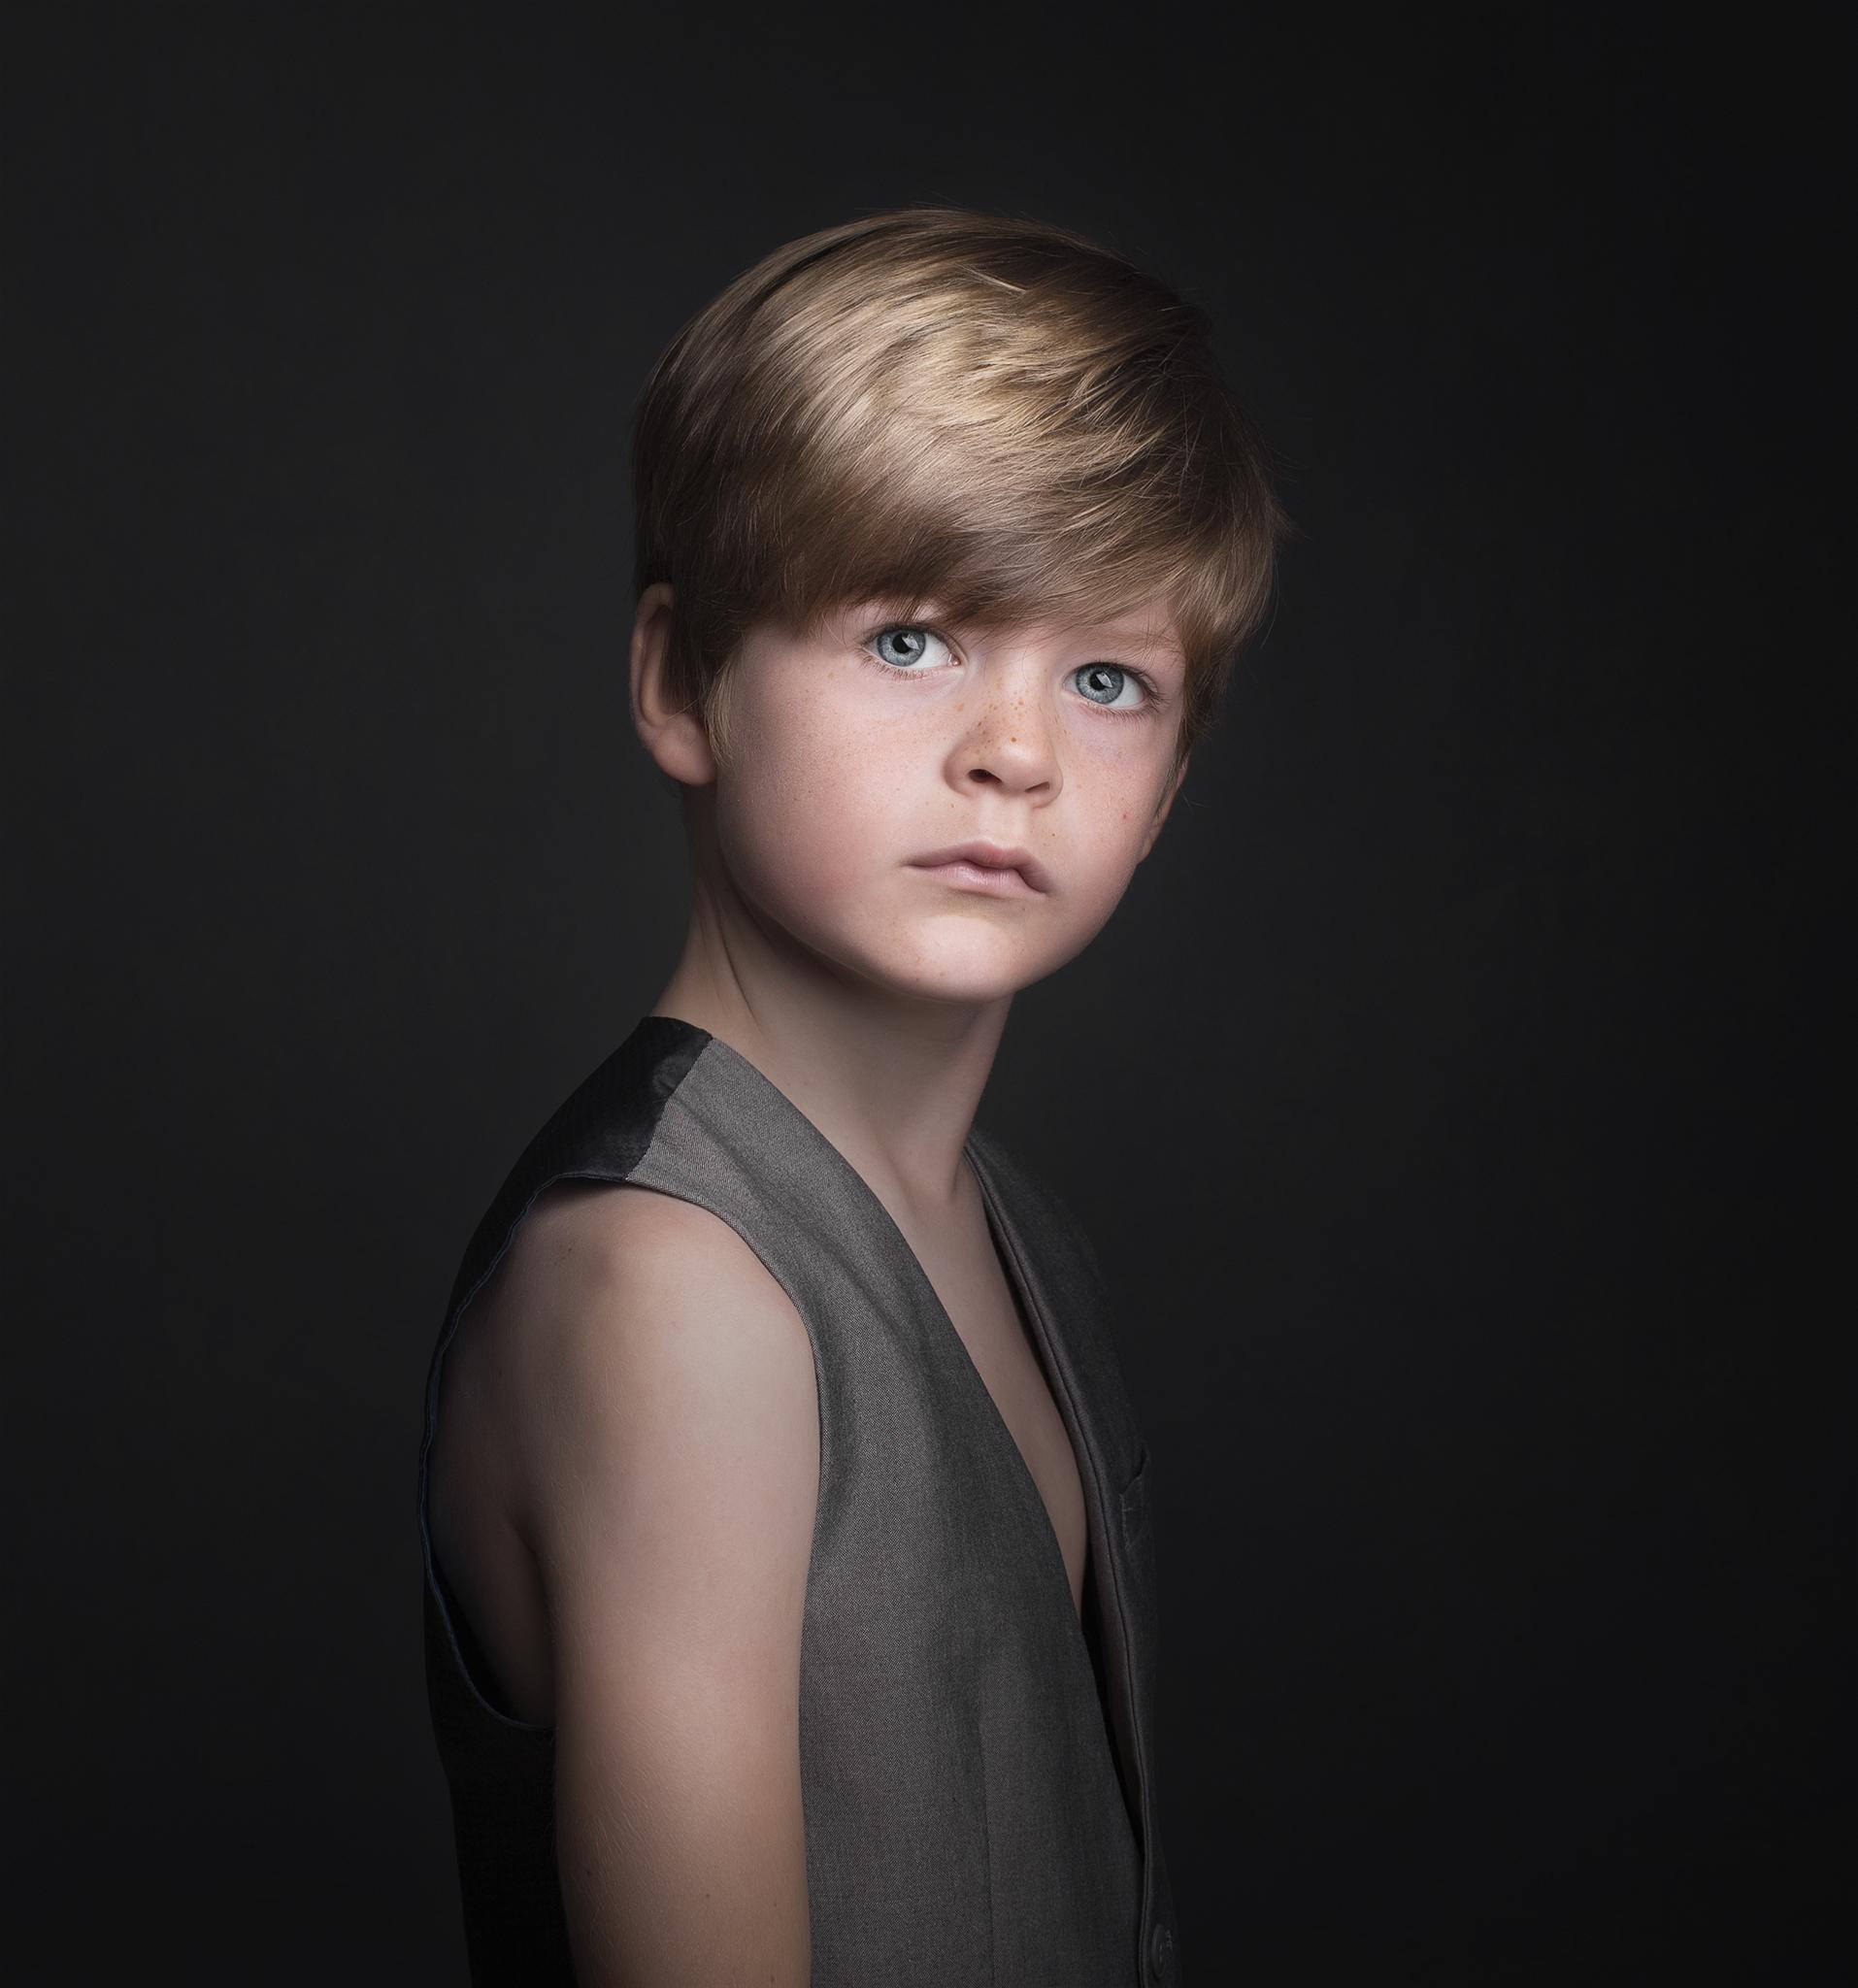 elizabethgfineartphotography_kingslangley_model_tristan_mentormodels_kiddiwinks_sugarkids_5.jpg